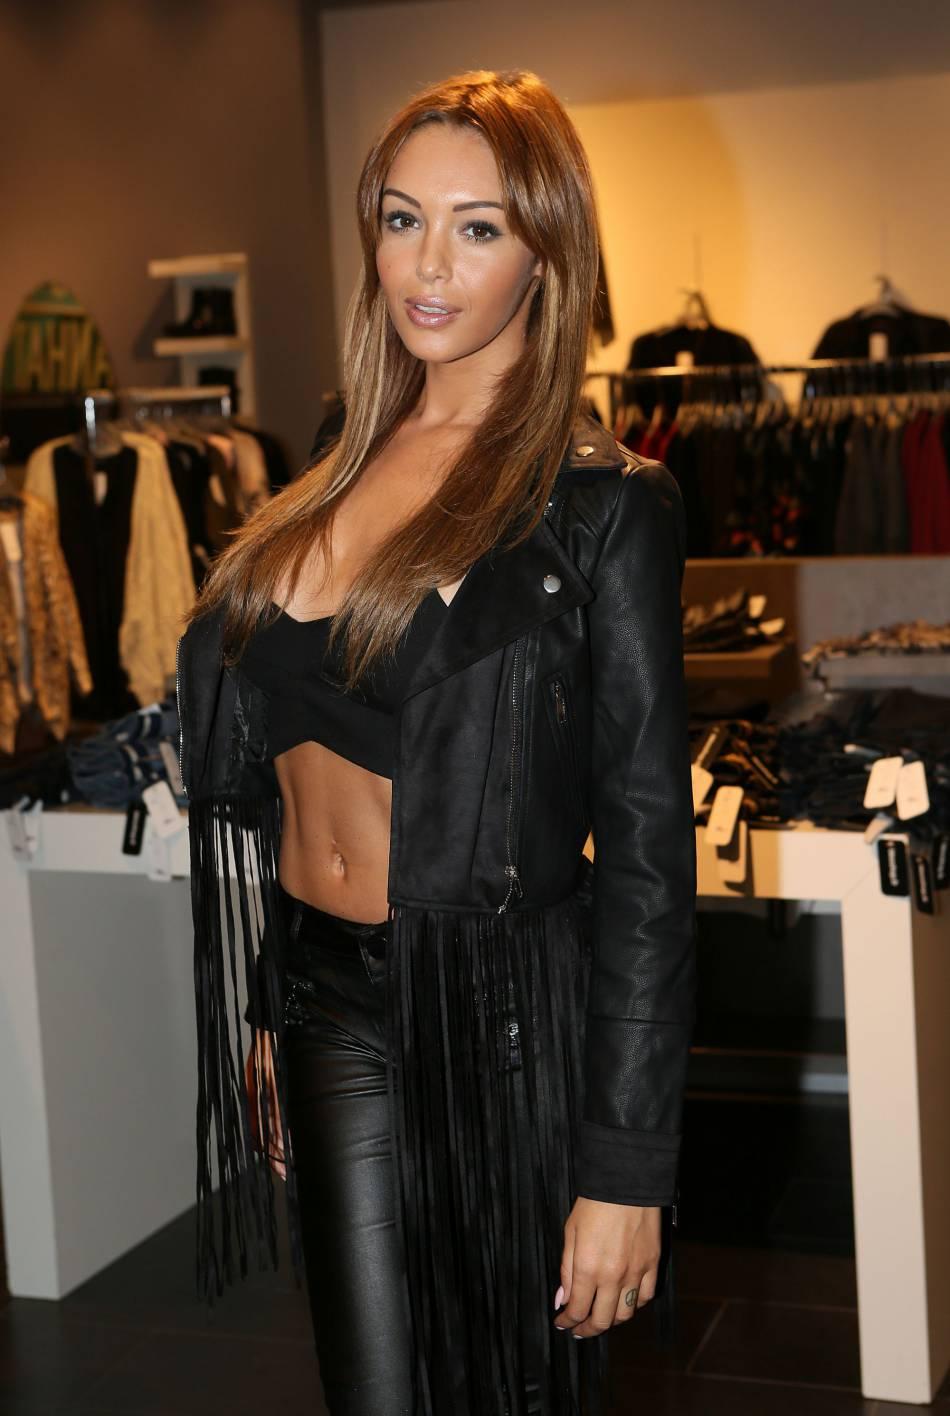 Nabilla, en véritable fan de Kim Kardashian, affiche son fessier pour ses followers adorés.